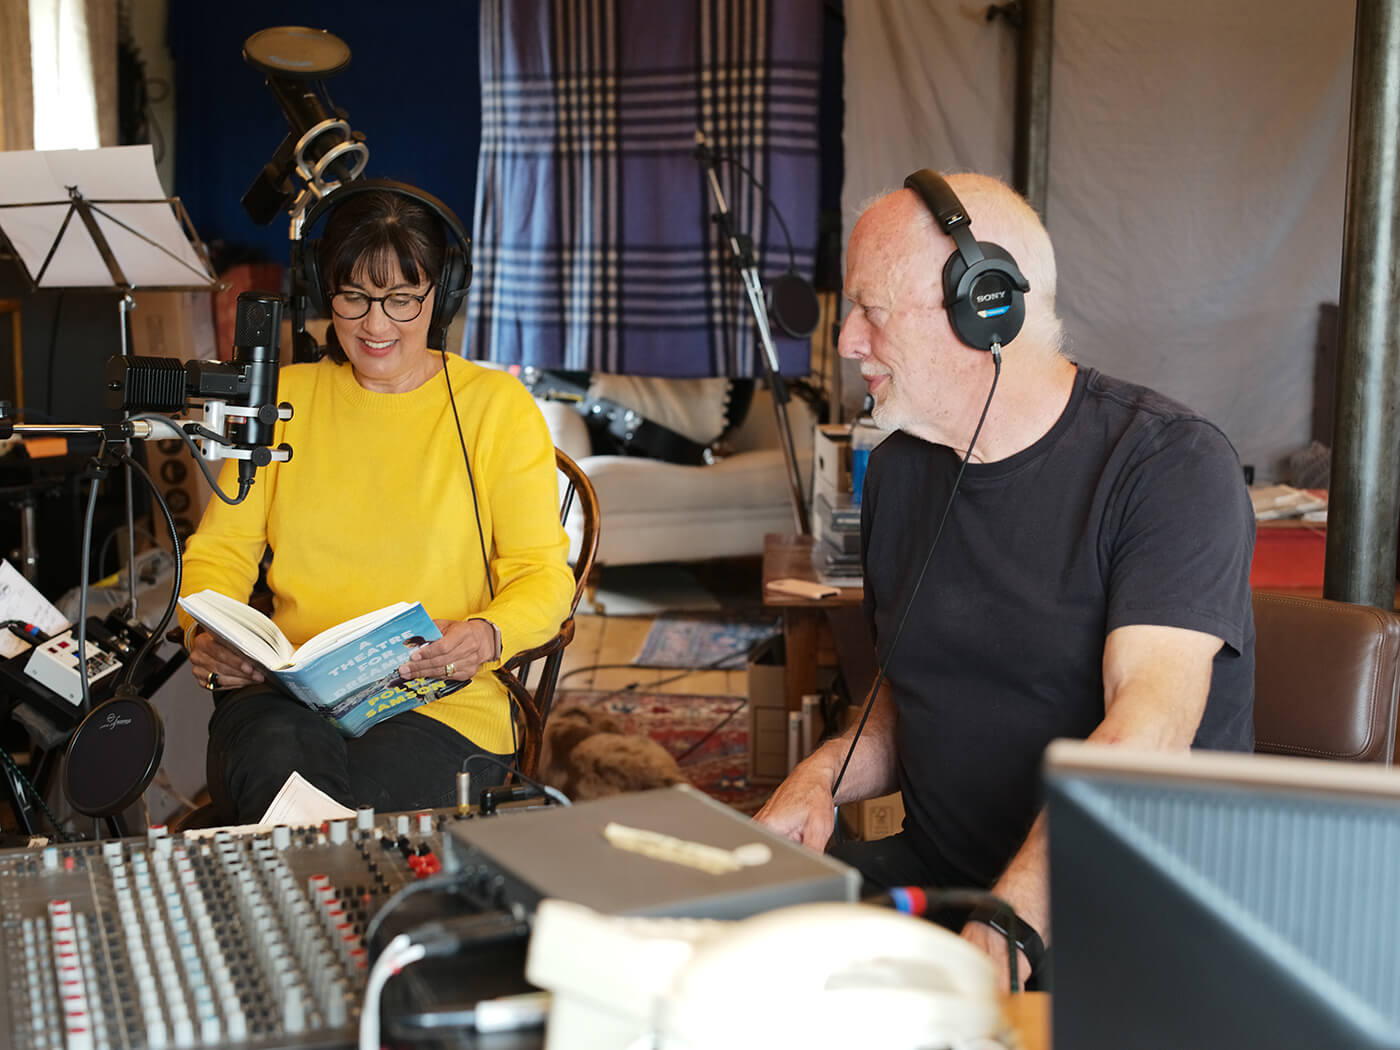 David Gilmour to release new music via Polly Samson's audiobook